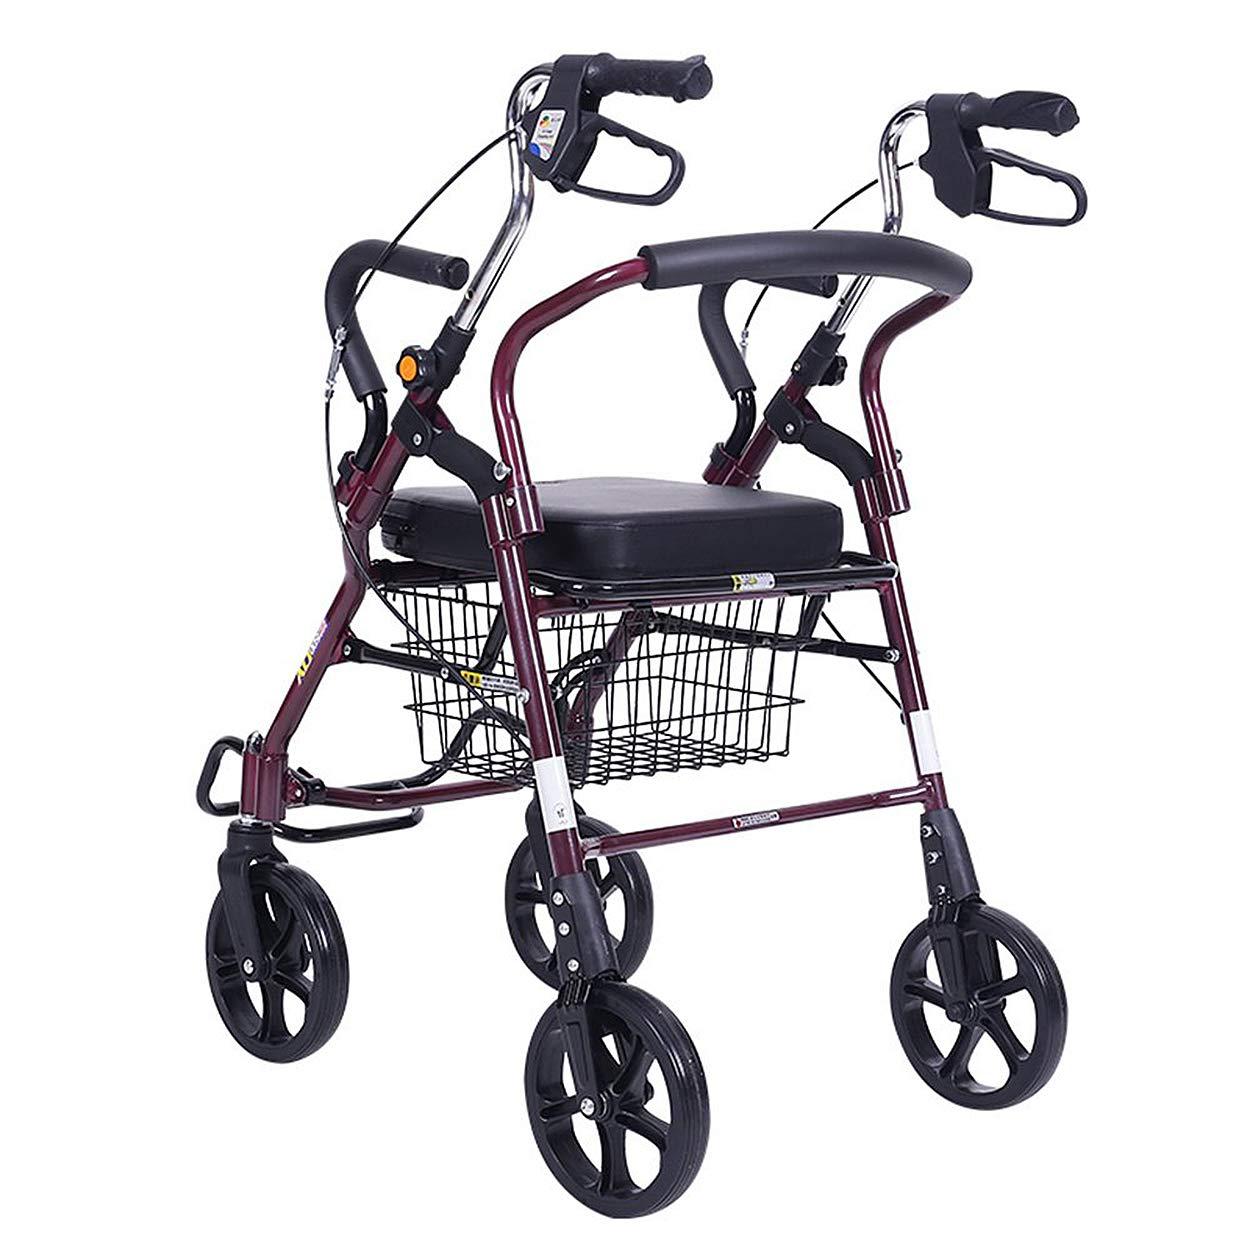 Amazon.com: Huhulala - Carrito de la compra para ancianos ...